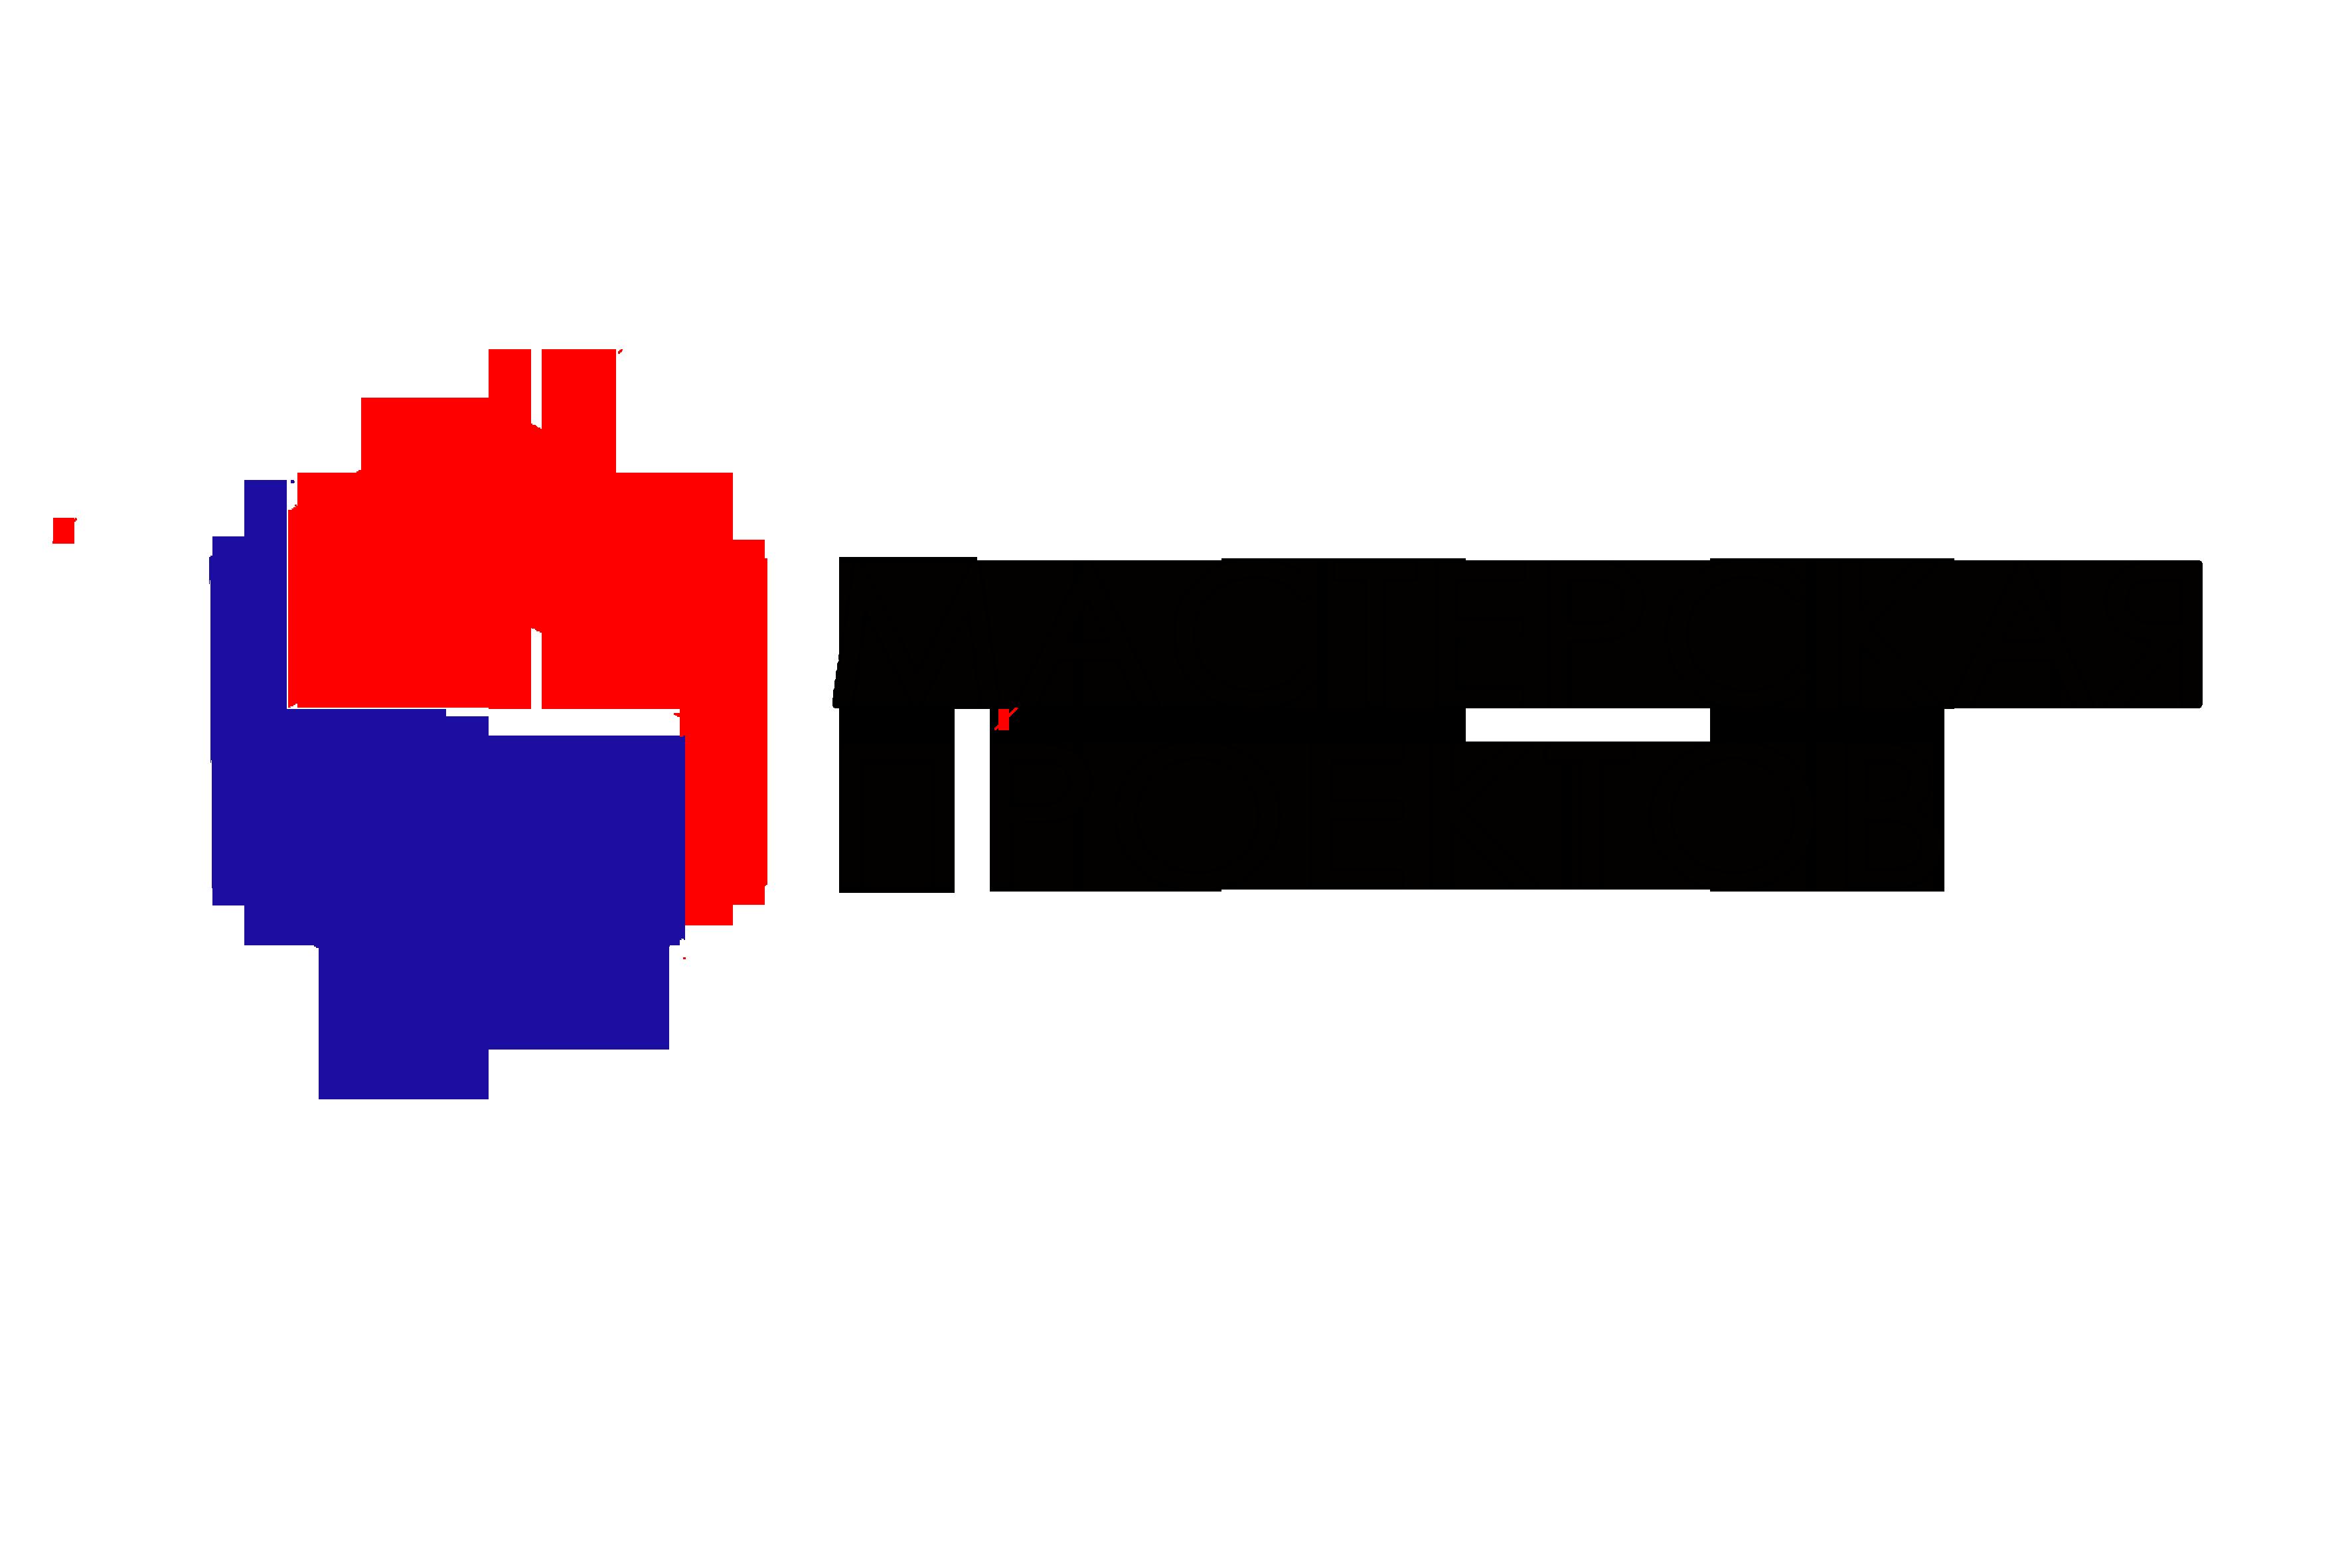 Разработка логотипа строительно-мебельного проекта (см. опис фото f_052606e7e621c120.png